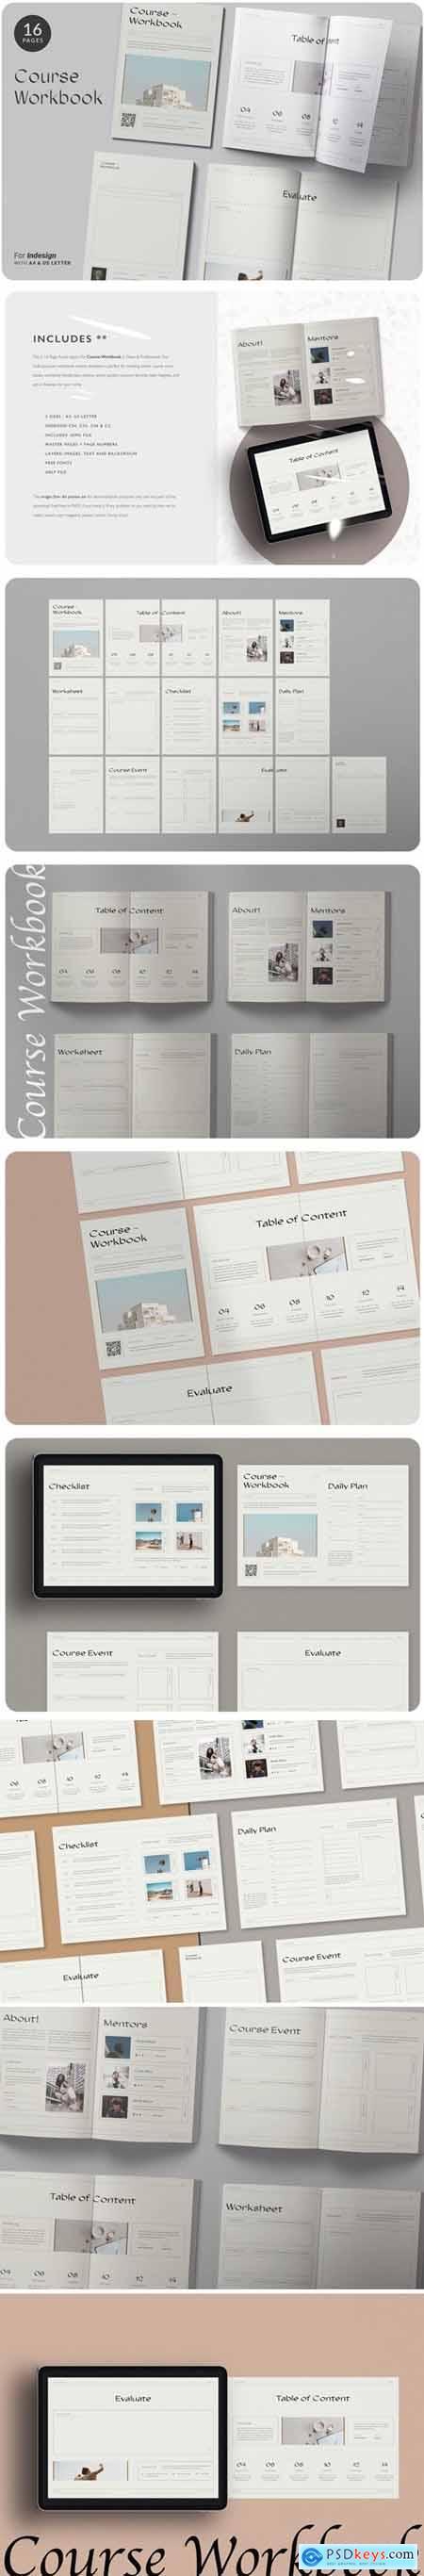 The Course Workbook - Minimal ZVYNQNJ